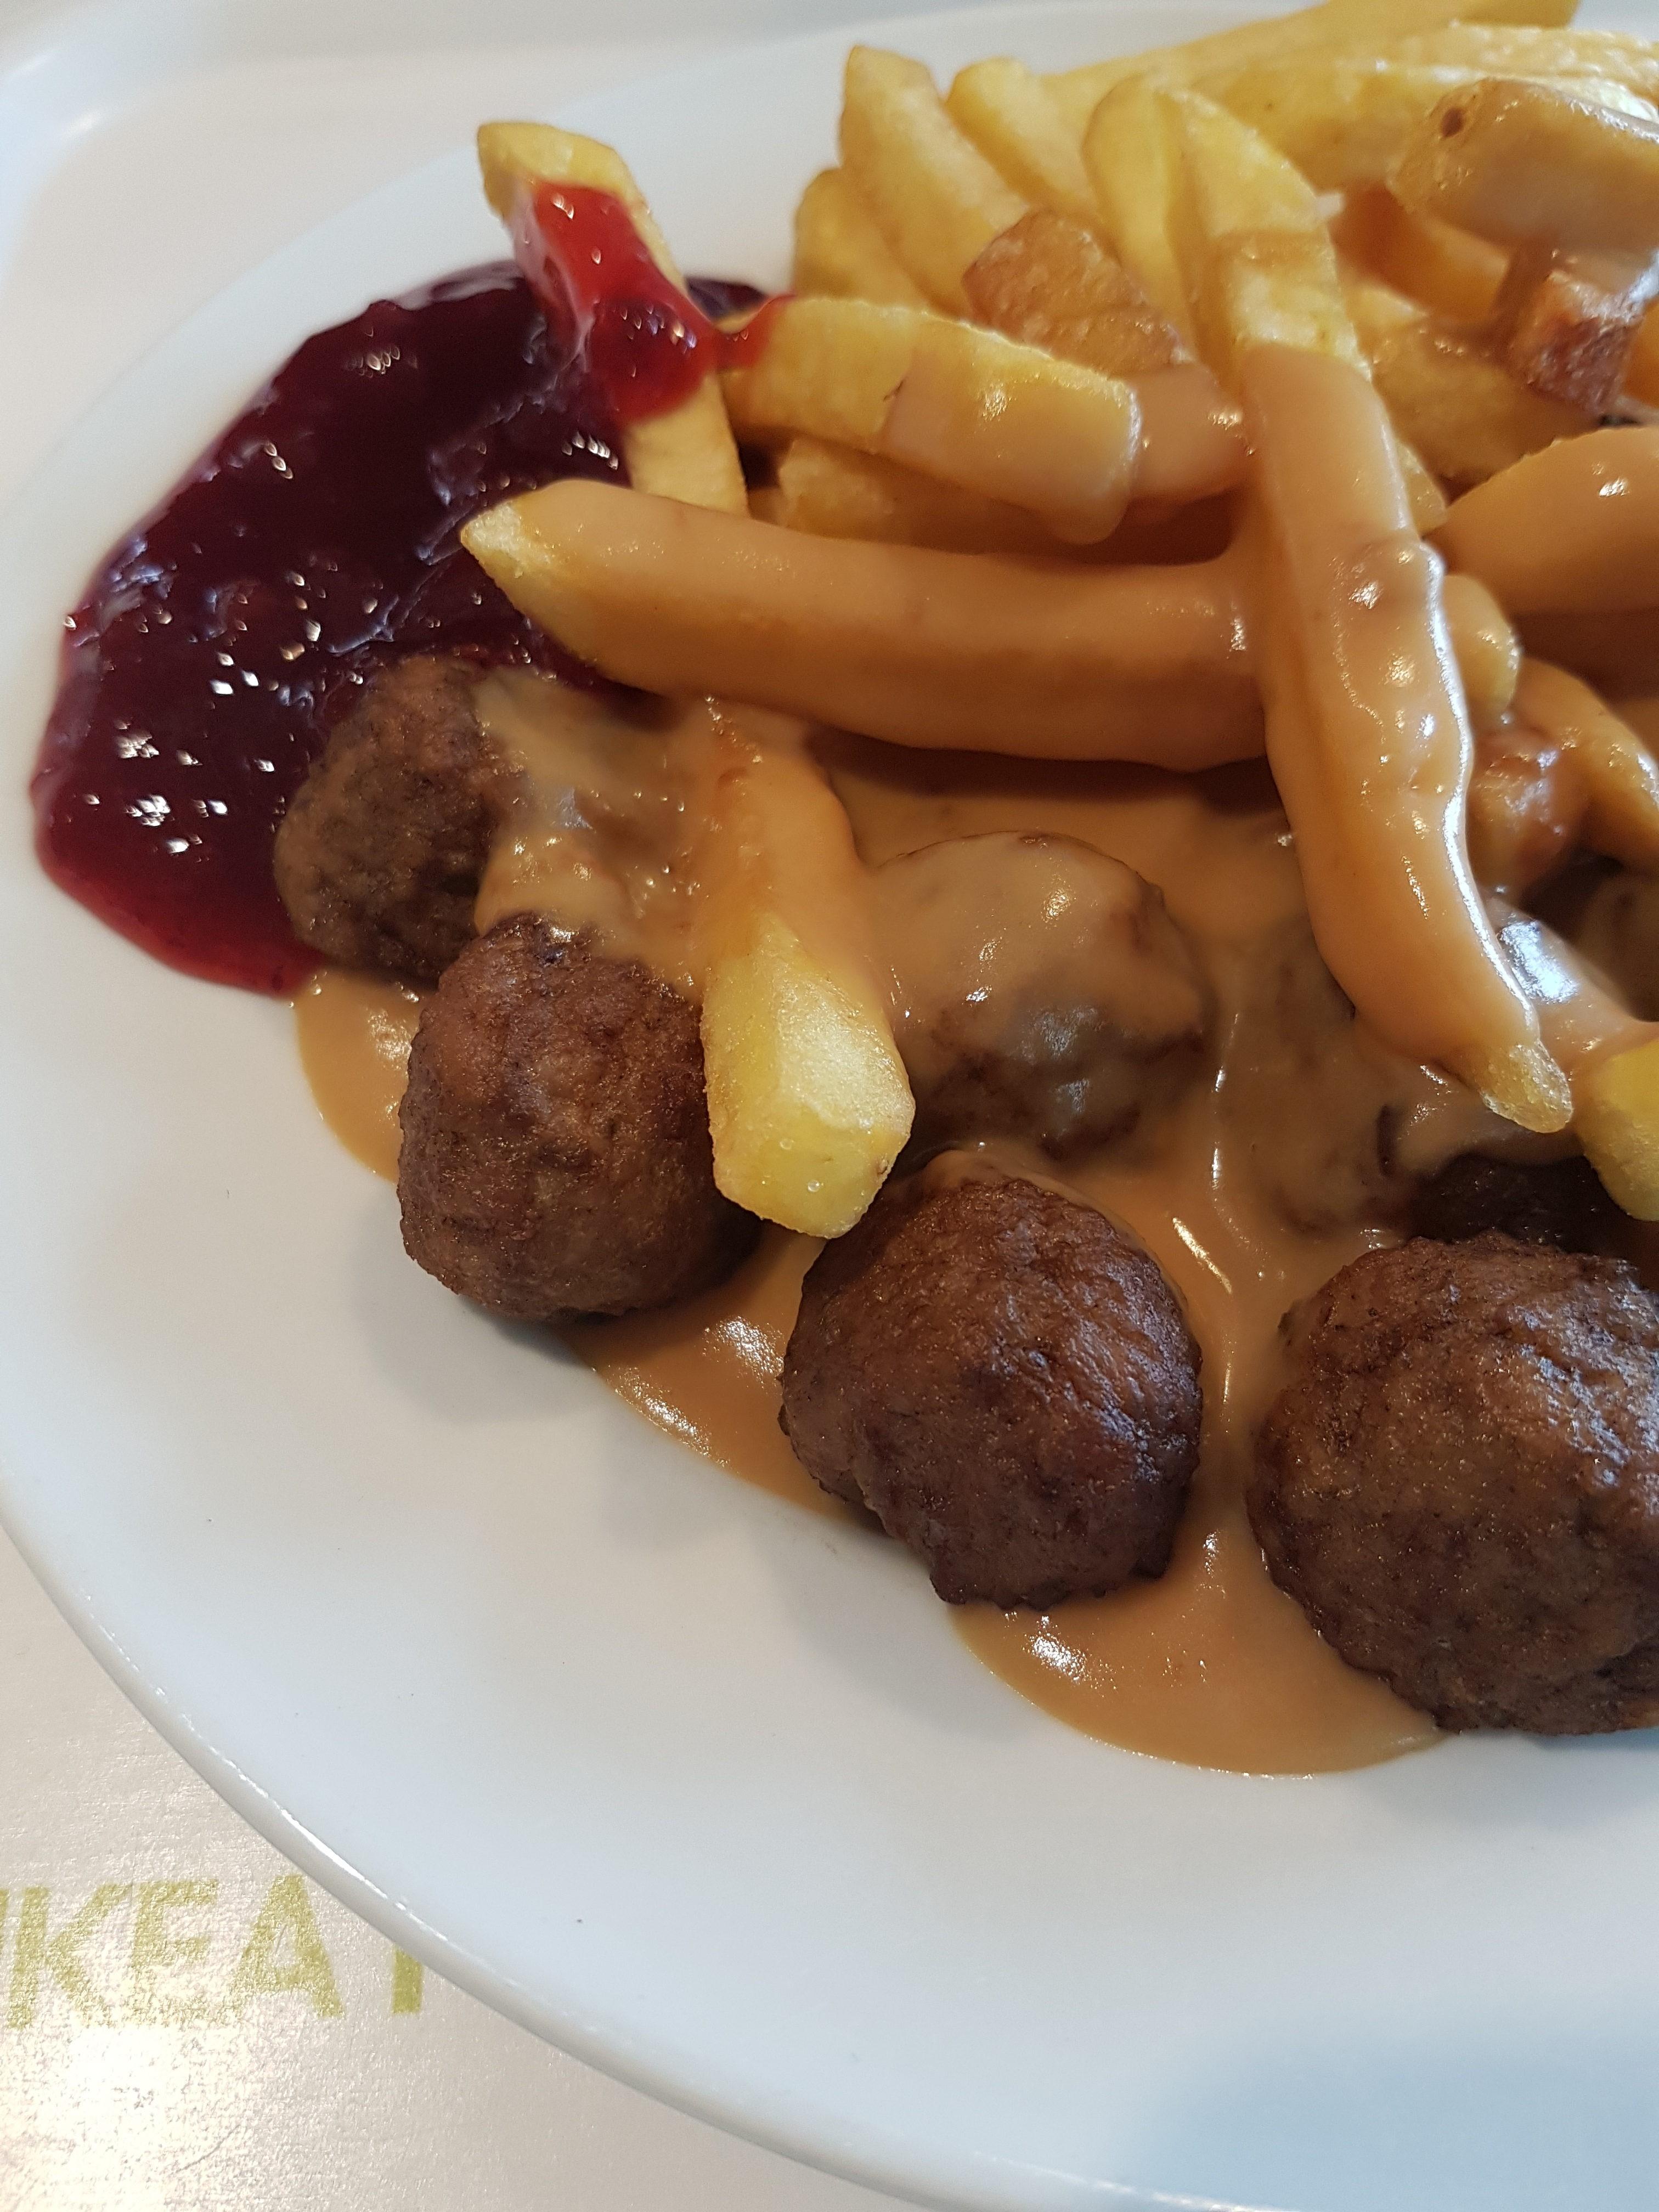 Wochenrückblick 17/ 2017 - Köttbuallar bei IKEA